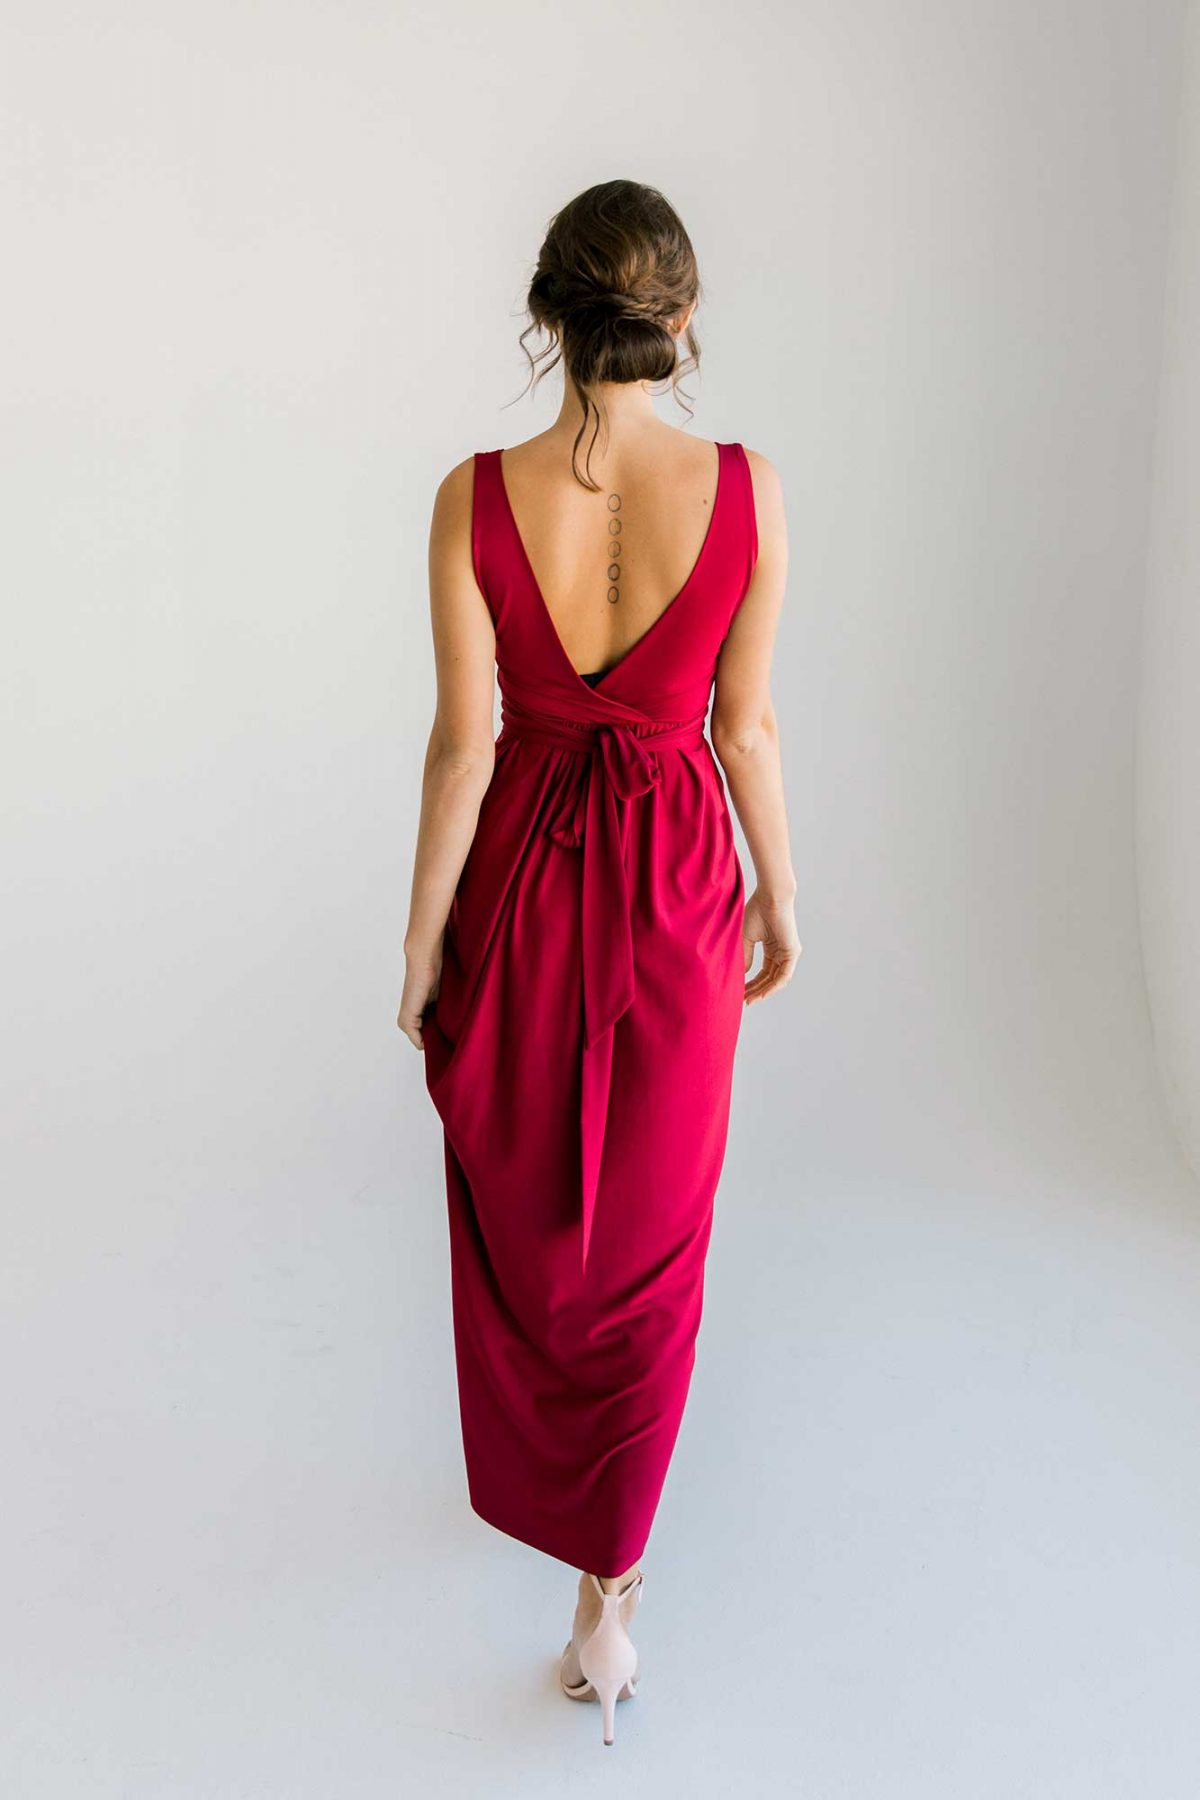 Zana dress in claret colour back view